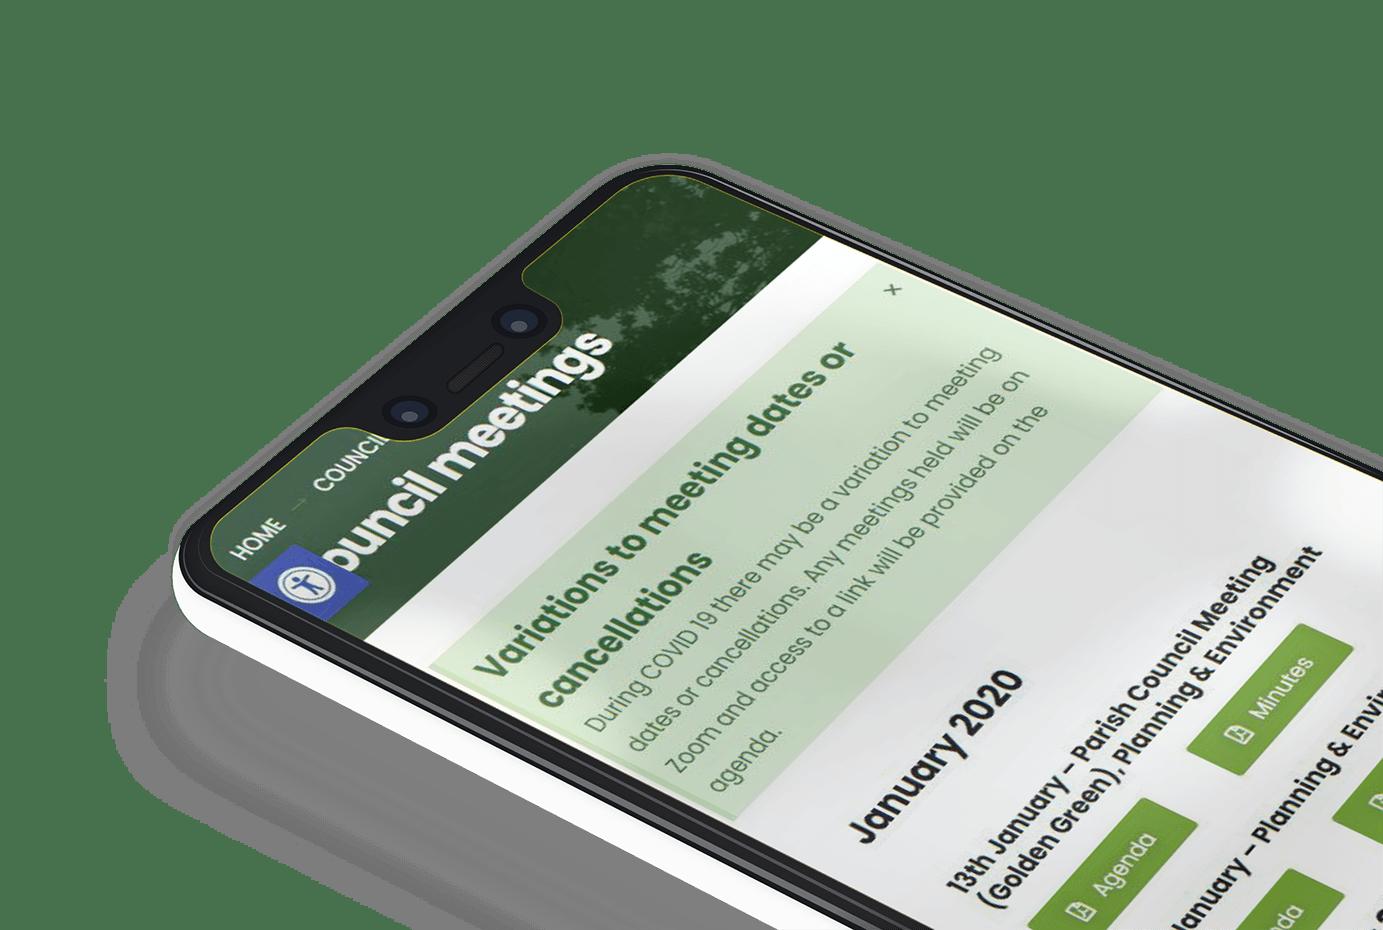 Hadlow Parish Council website shown on a mobile phone